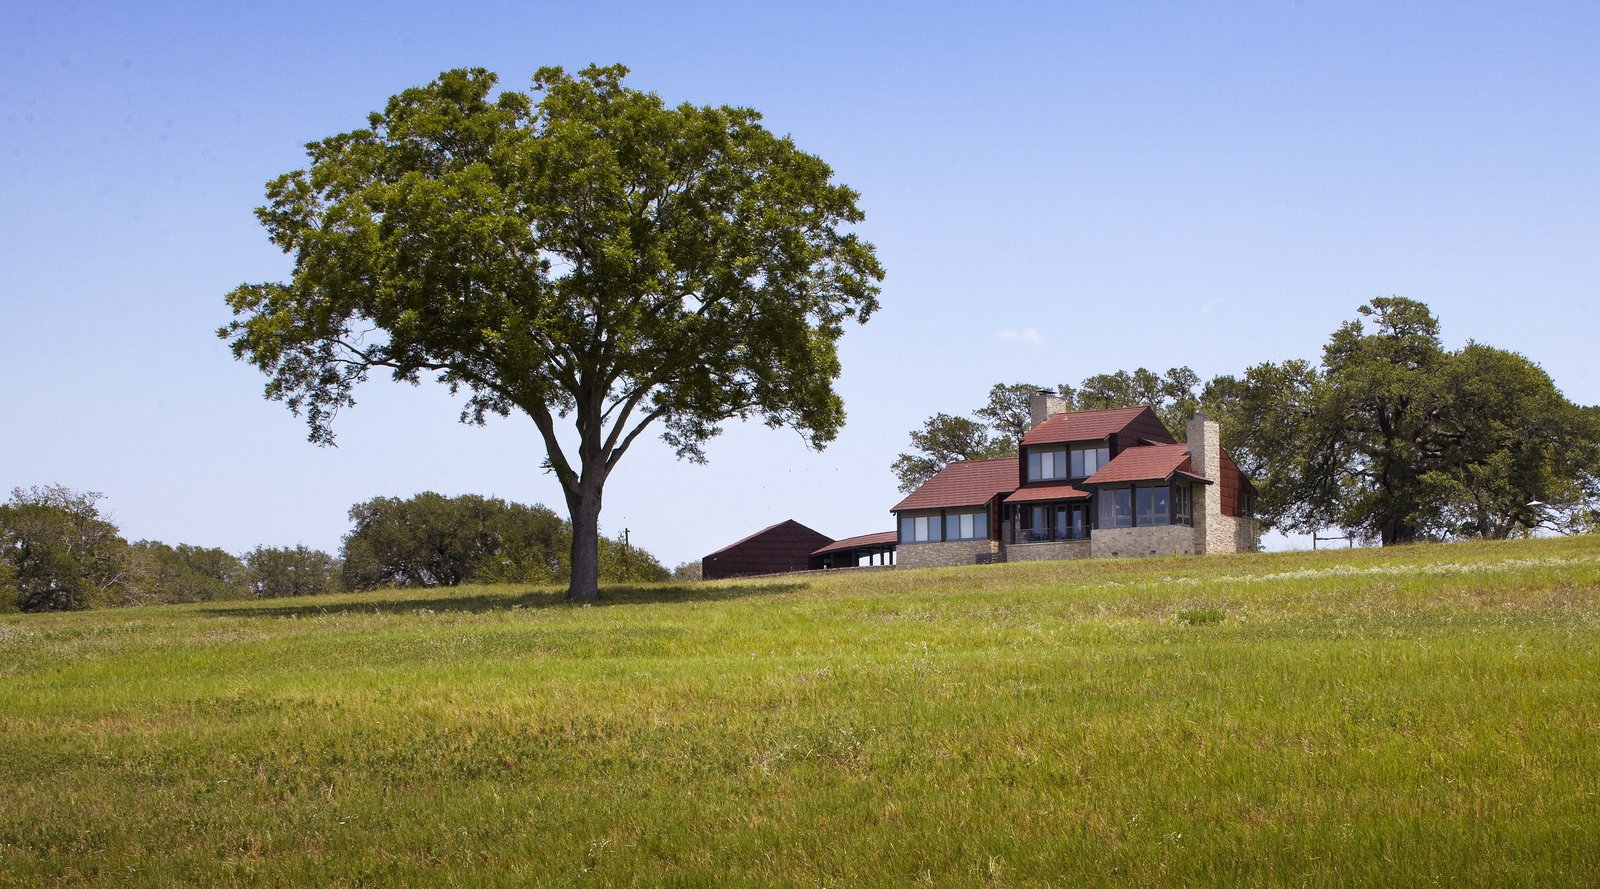 Seward Residence by Dillon Kyle Architects